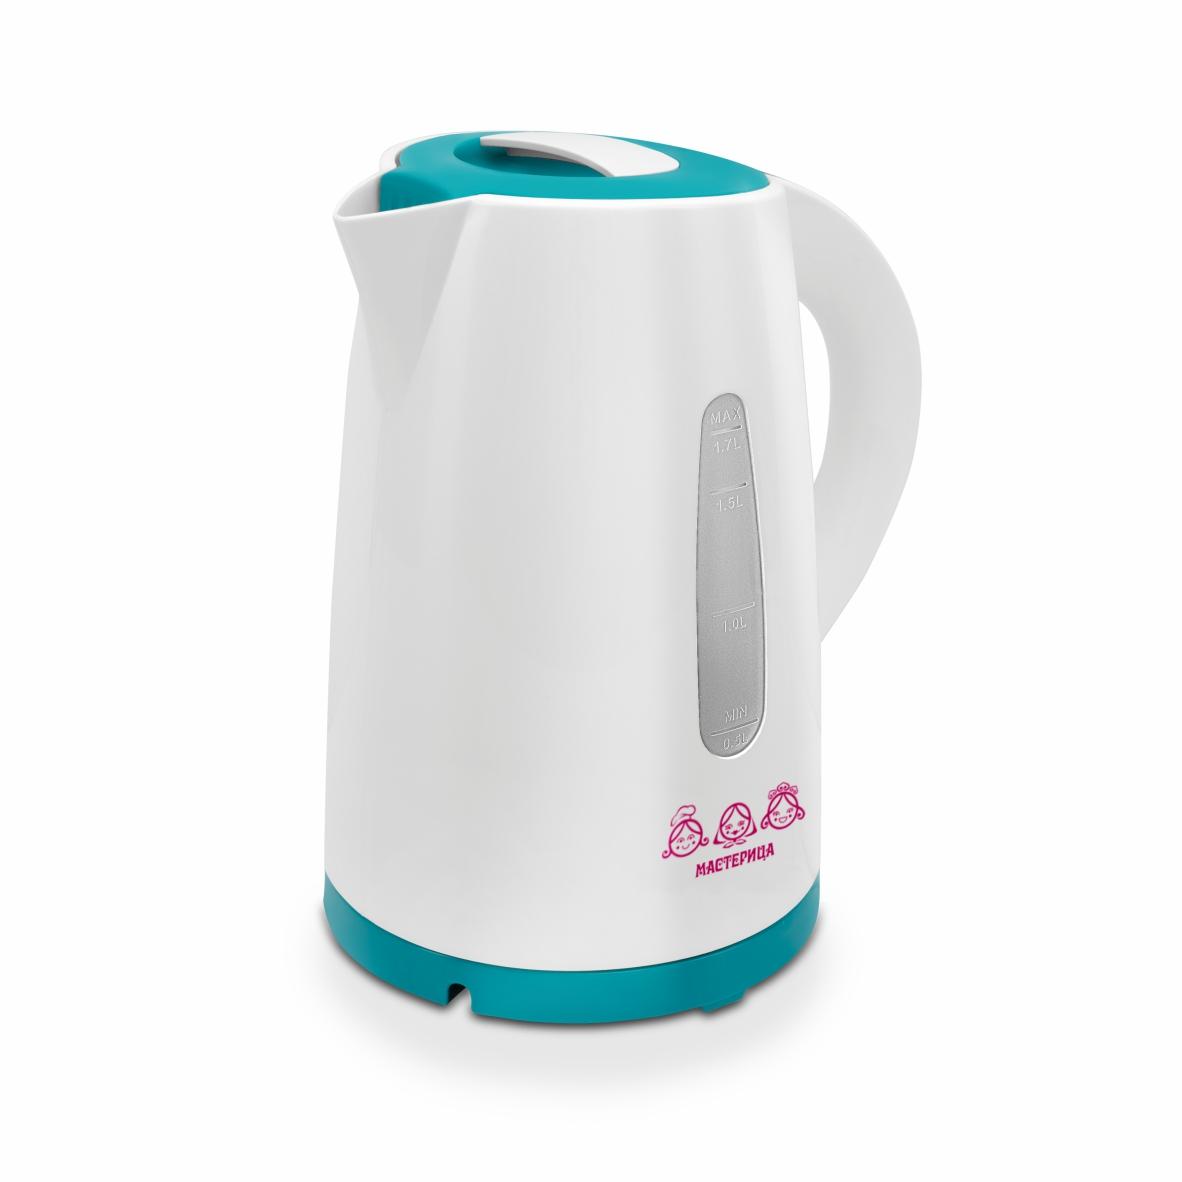 Чайник электрический Мастерица ЕК-1701M белый/бирюзовый, 1,7 л, пластик, 1850 Вт